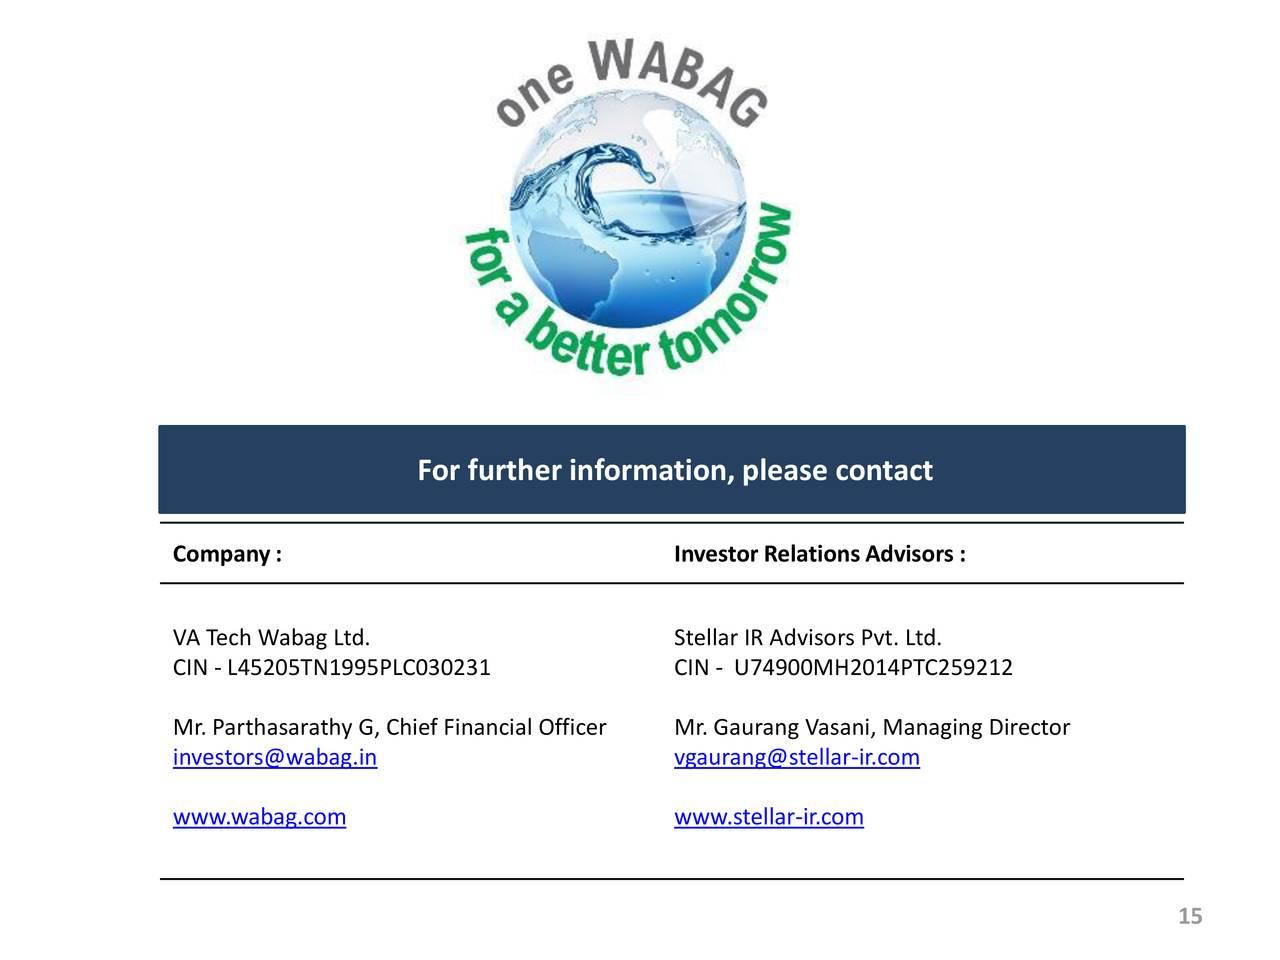 VA Tech Wabag Ltd ADR 2018 Q3 - Results - Earnings Call ...